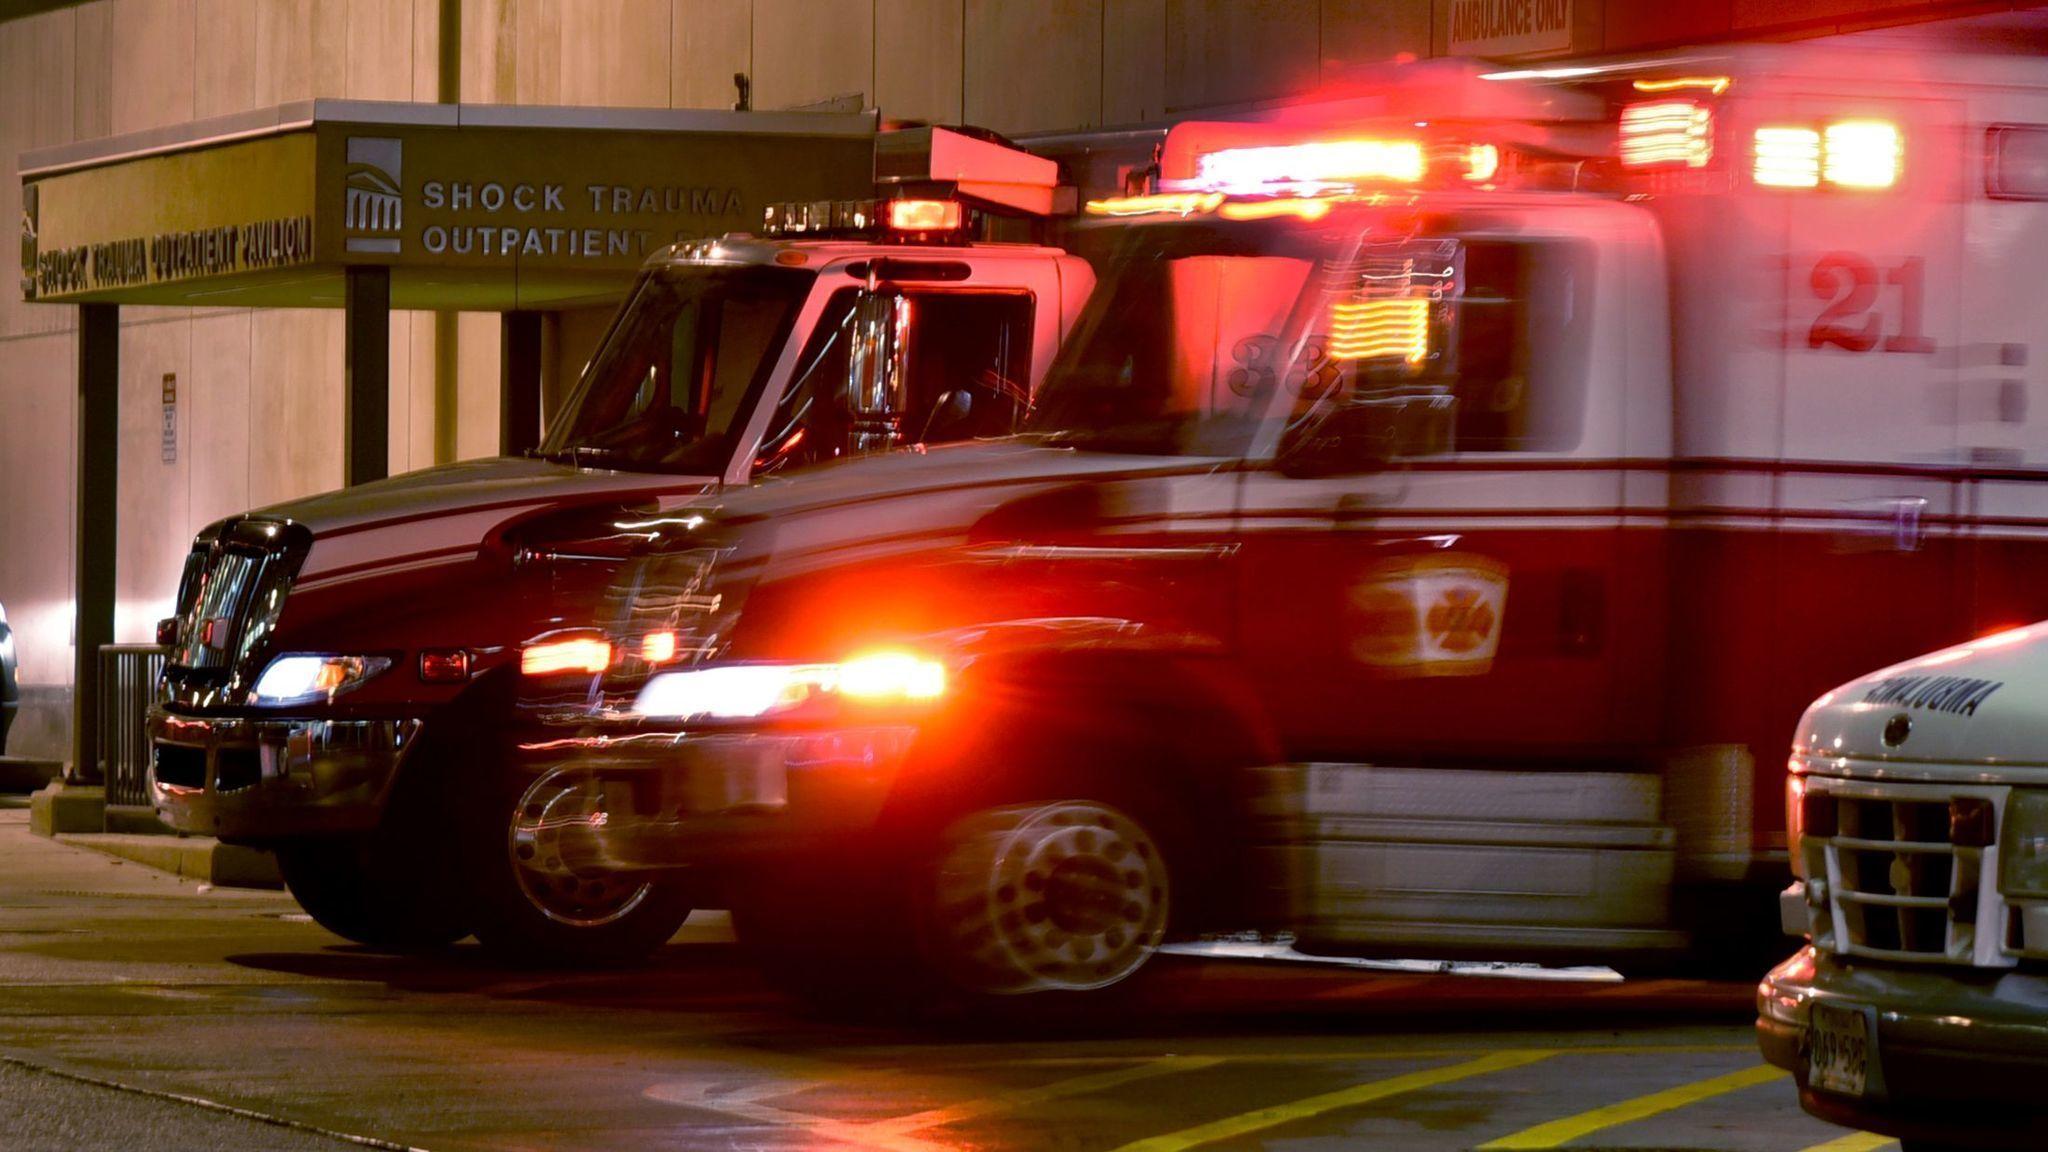 1 killed, 2 injured in Columbia car collision - Baltimore Sun